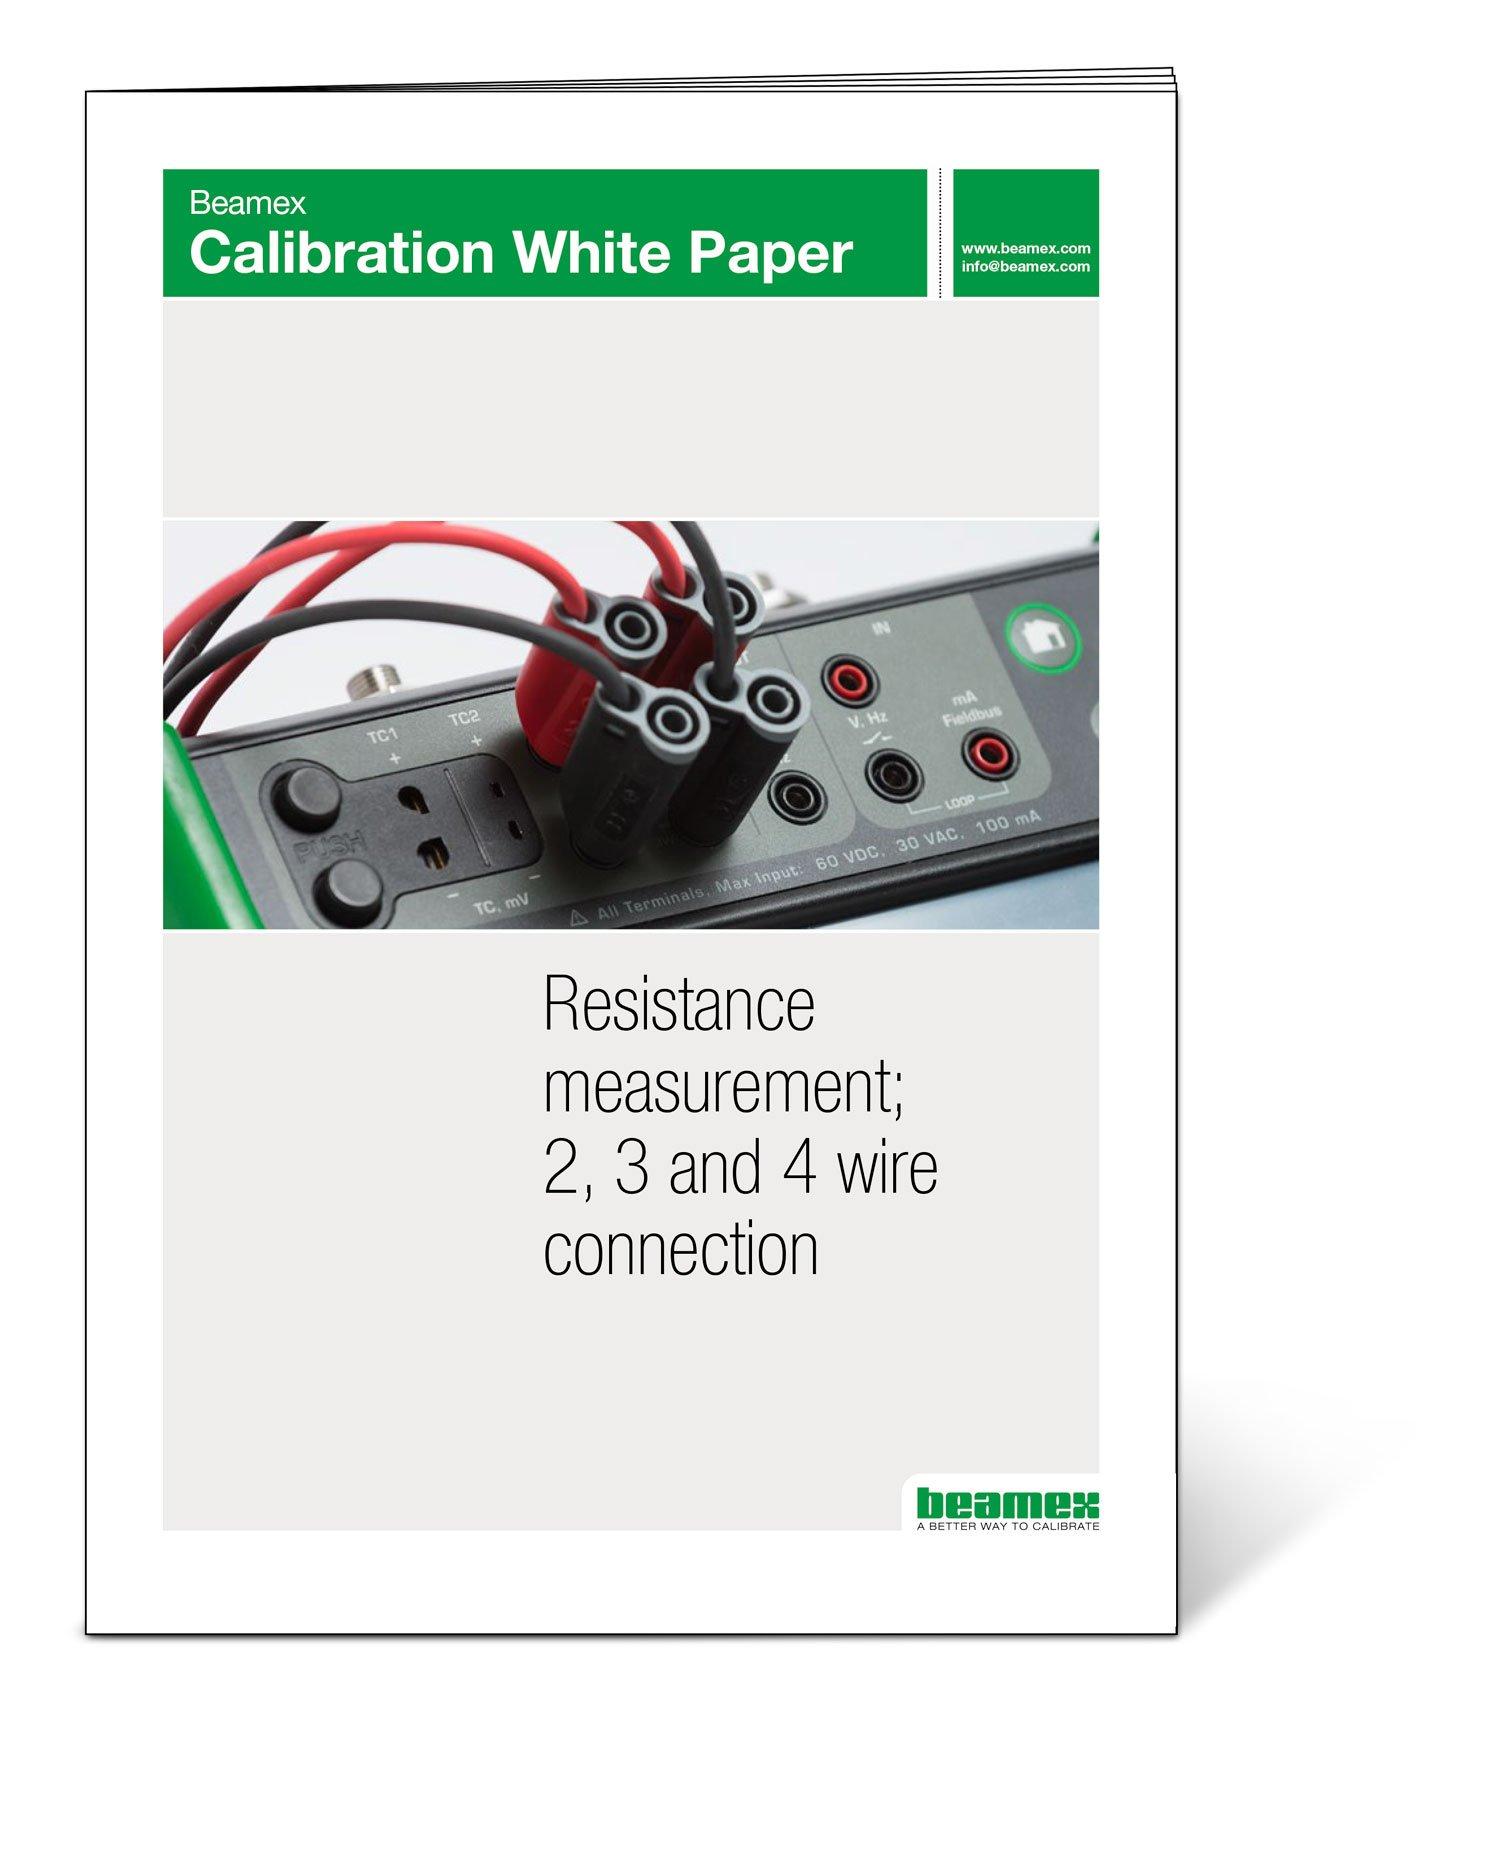 Beamex-WP-Resistance-measurement-1500px-v1